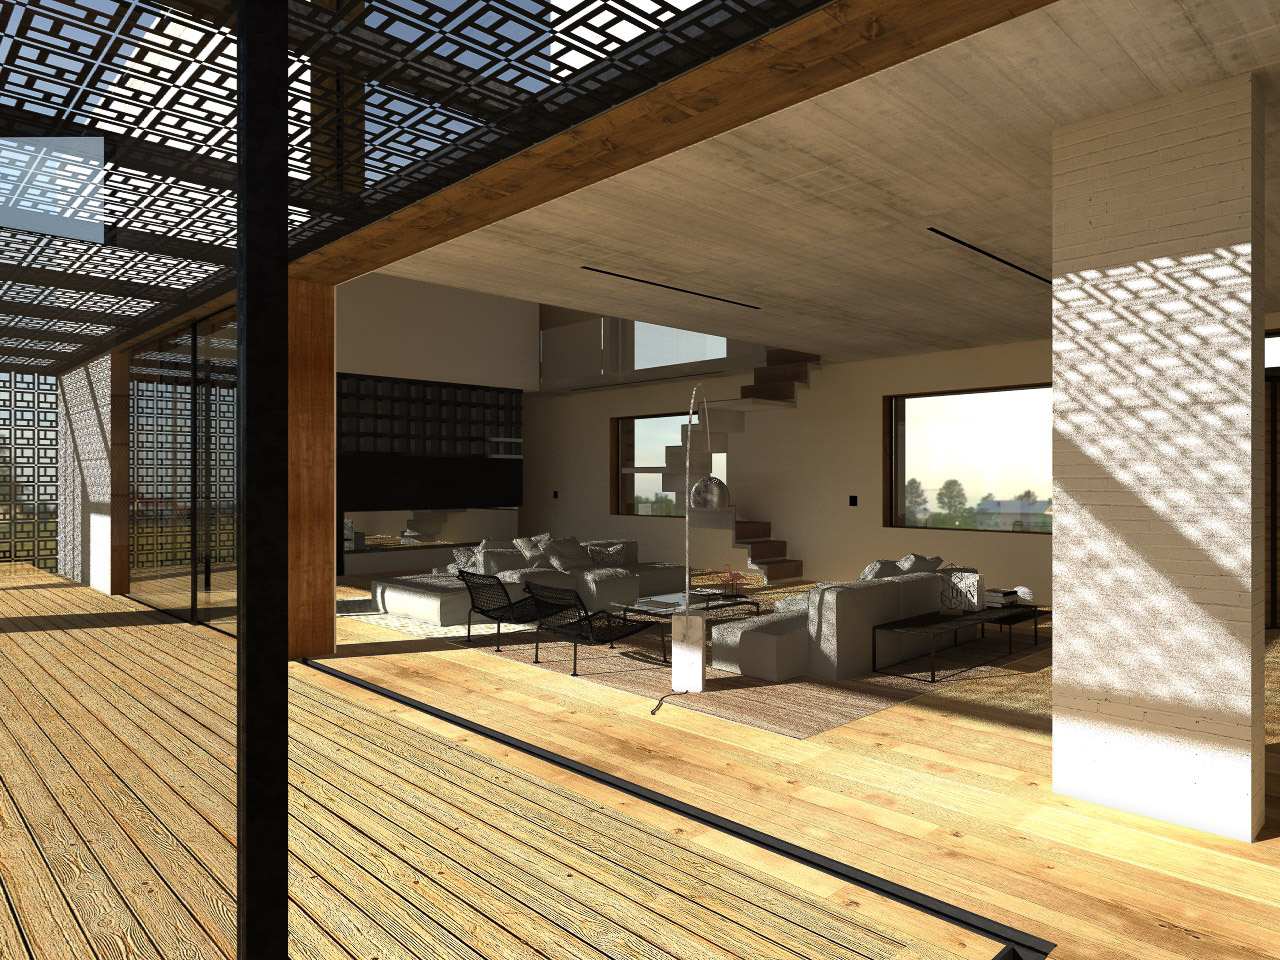 renover-rehabilitation-ferme-grange-architecte-façade-travaux-permis-de-construire-3